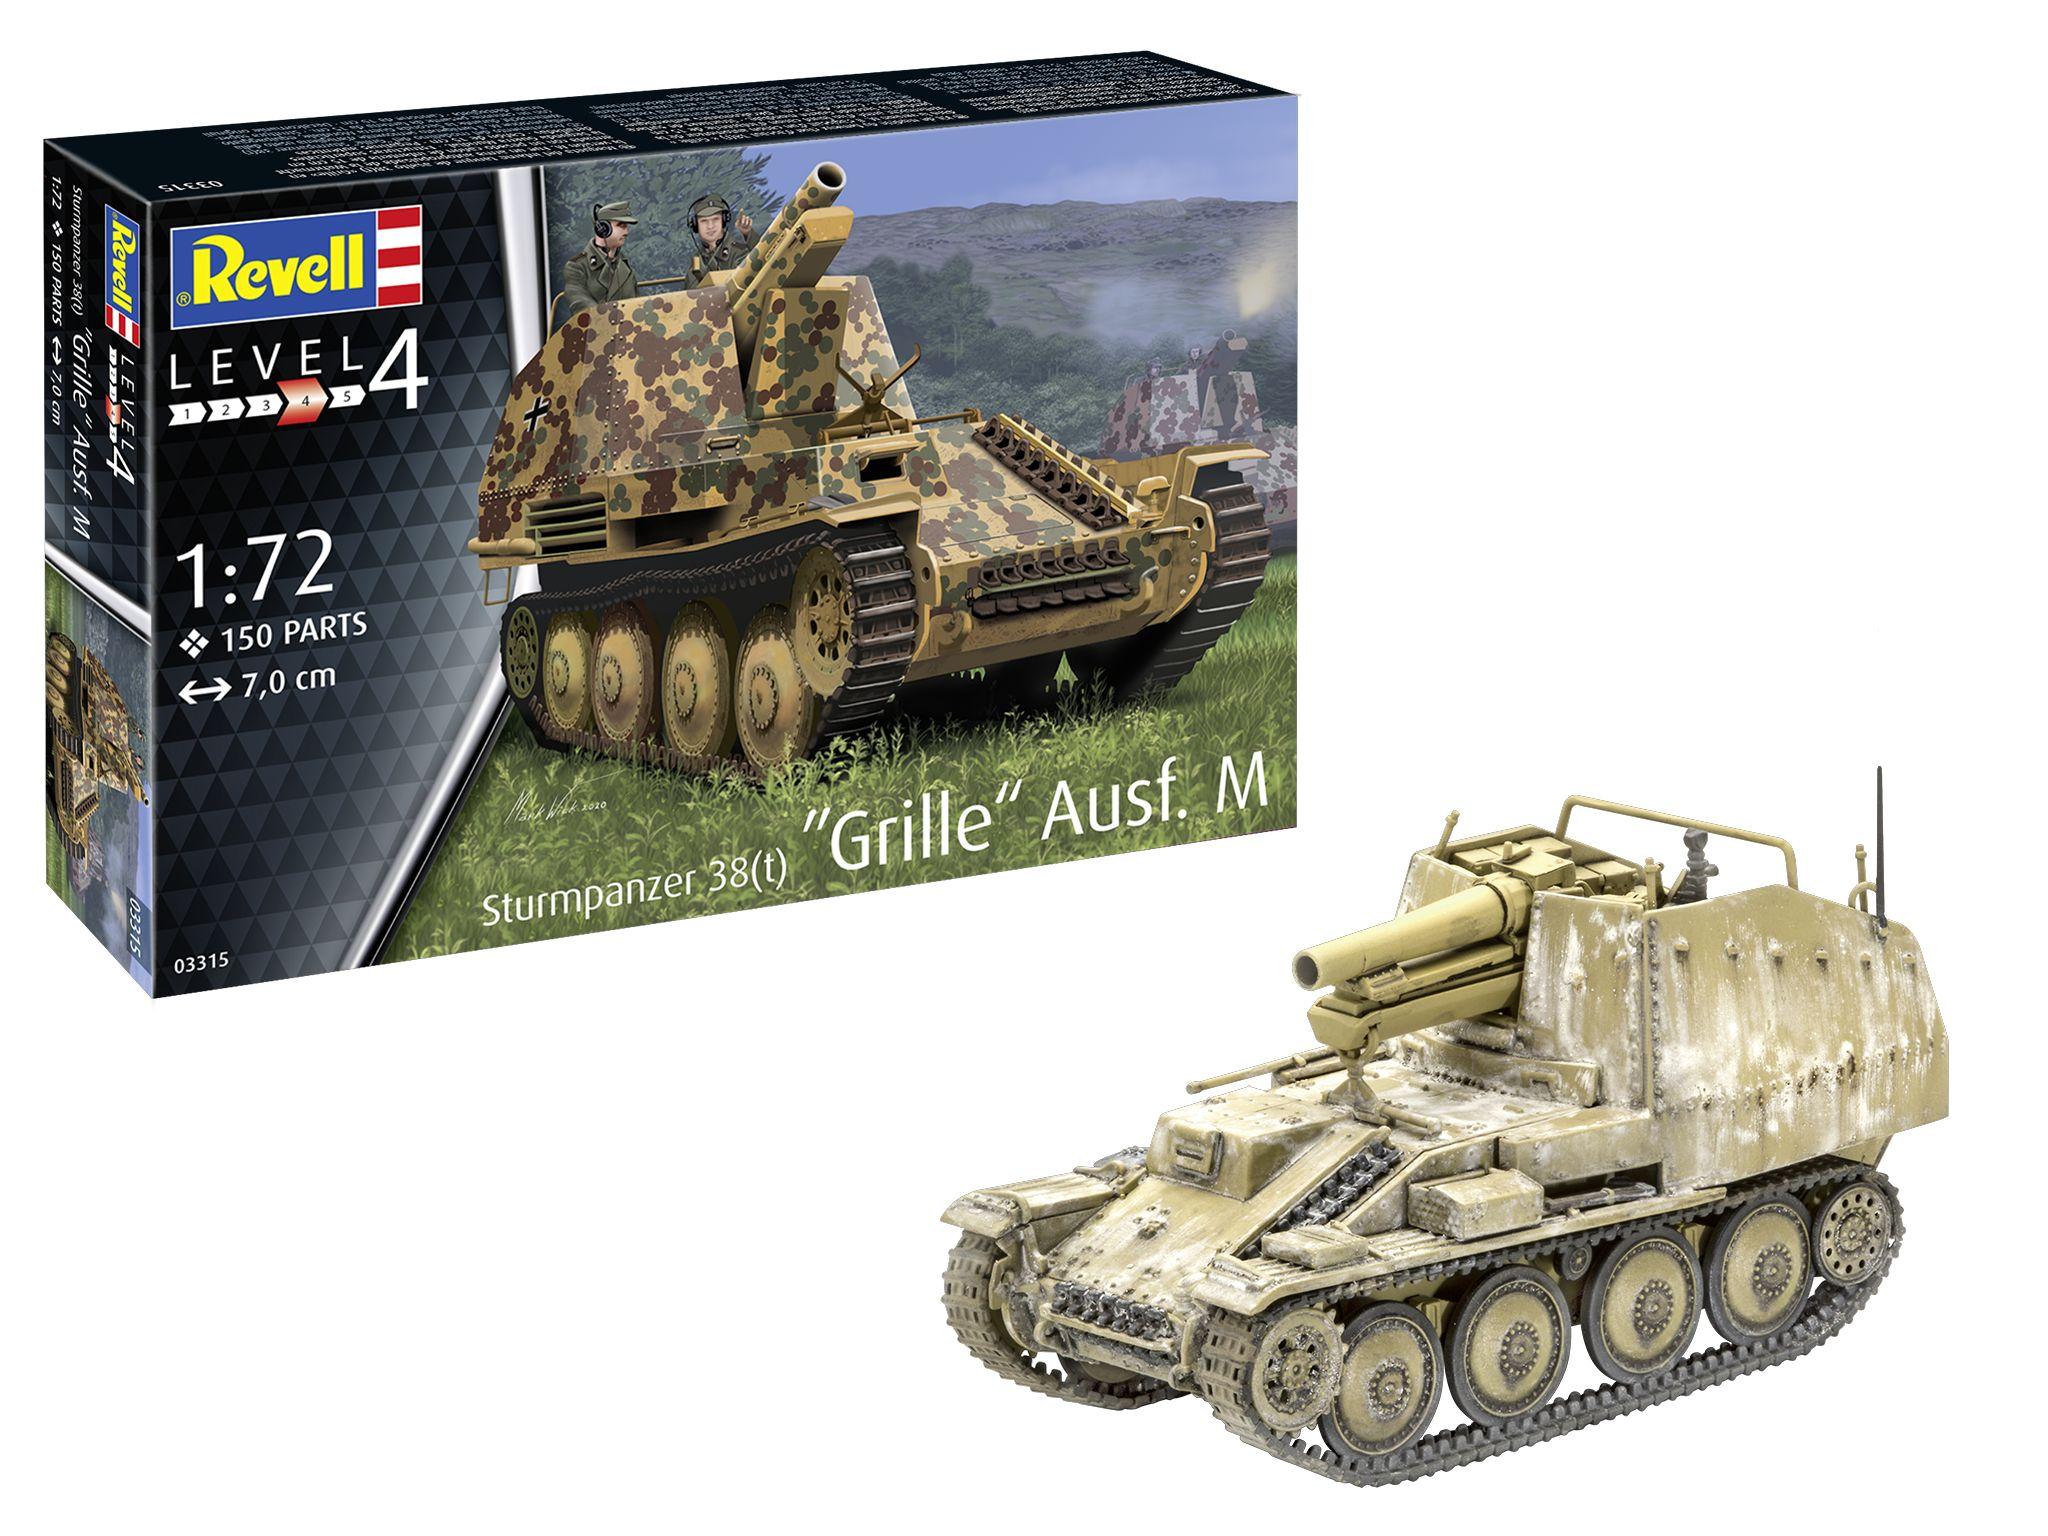 Revell-03315-Sturmpanzer-38t-Grille-Ausf.-M Revell Neuheiten 2021